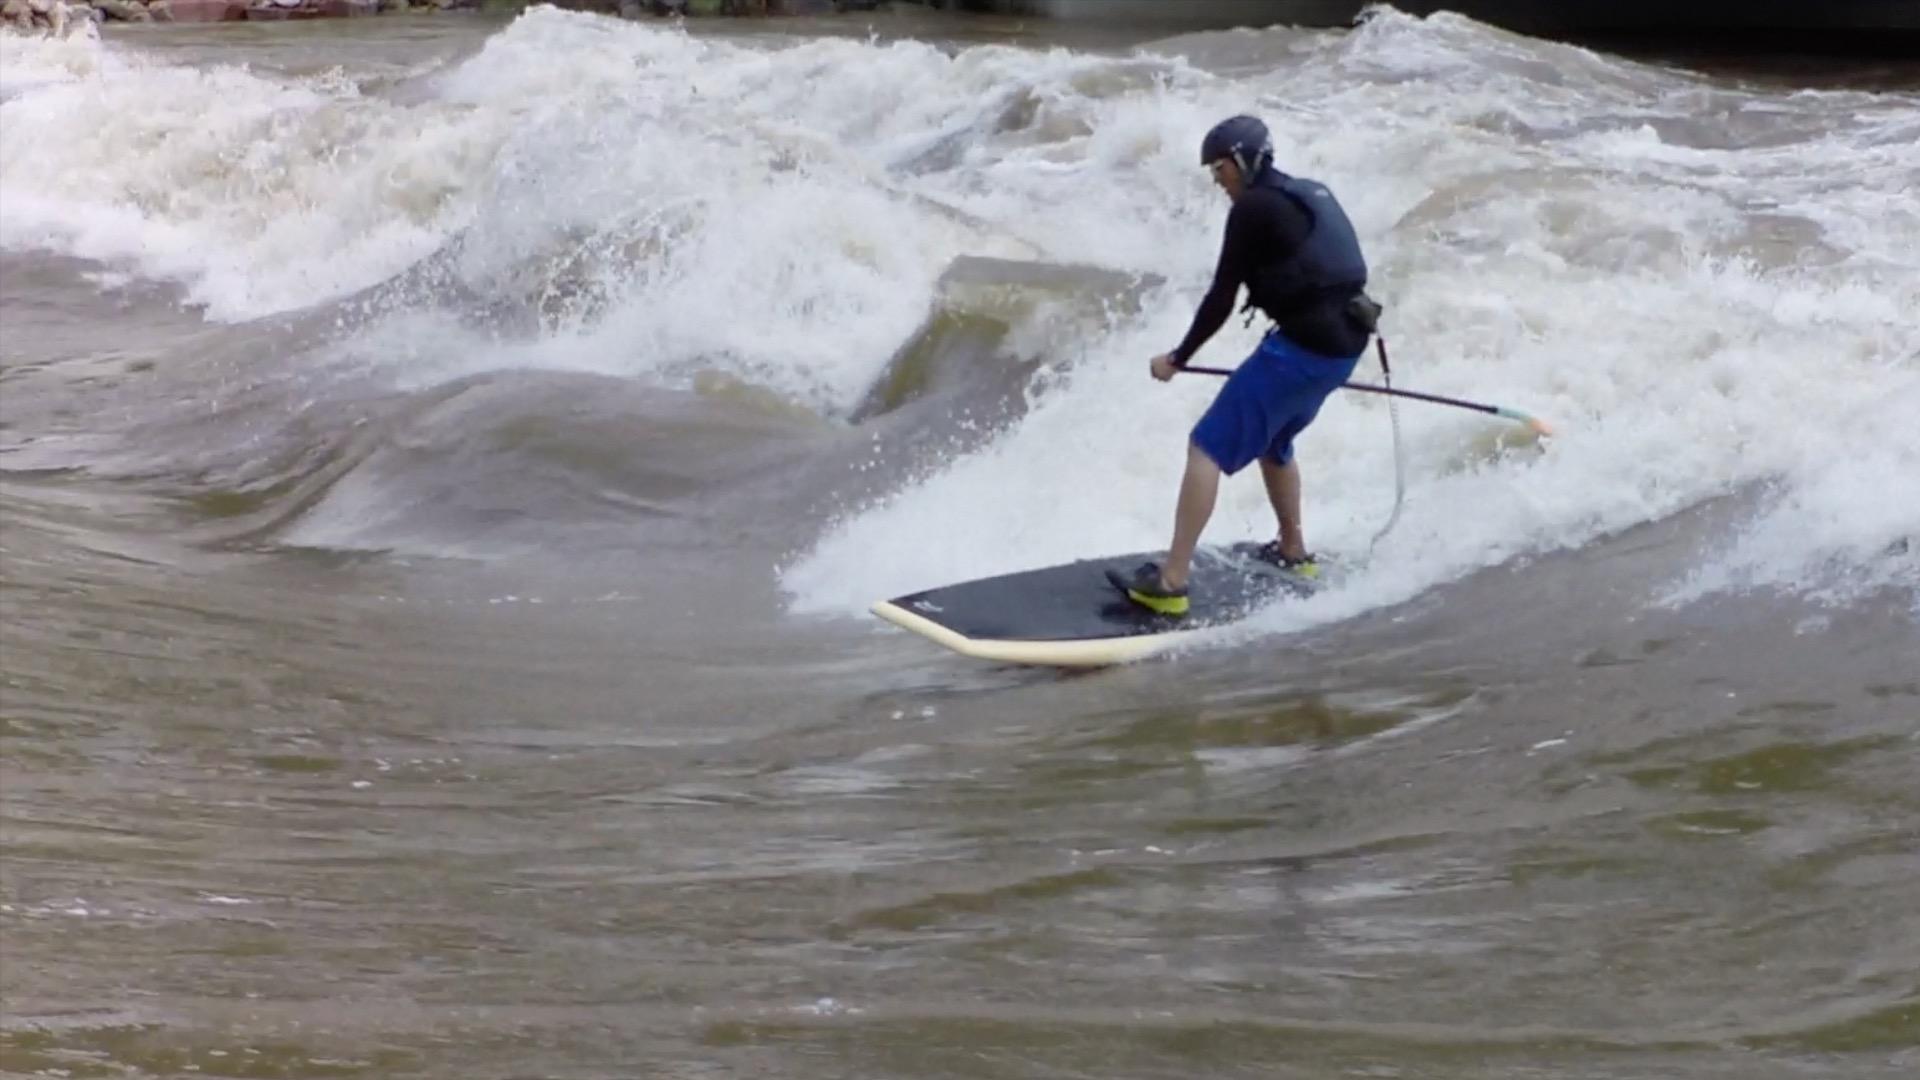 SUP river surfing Glenwood Springs